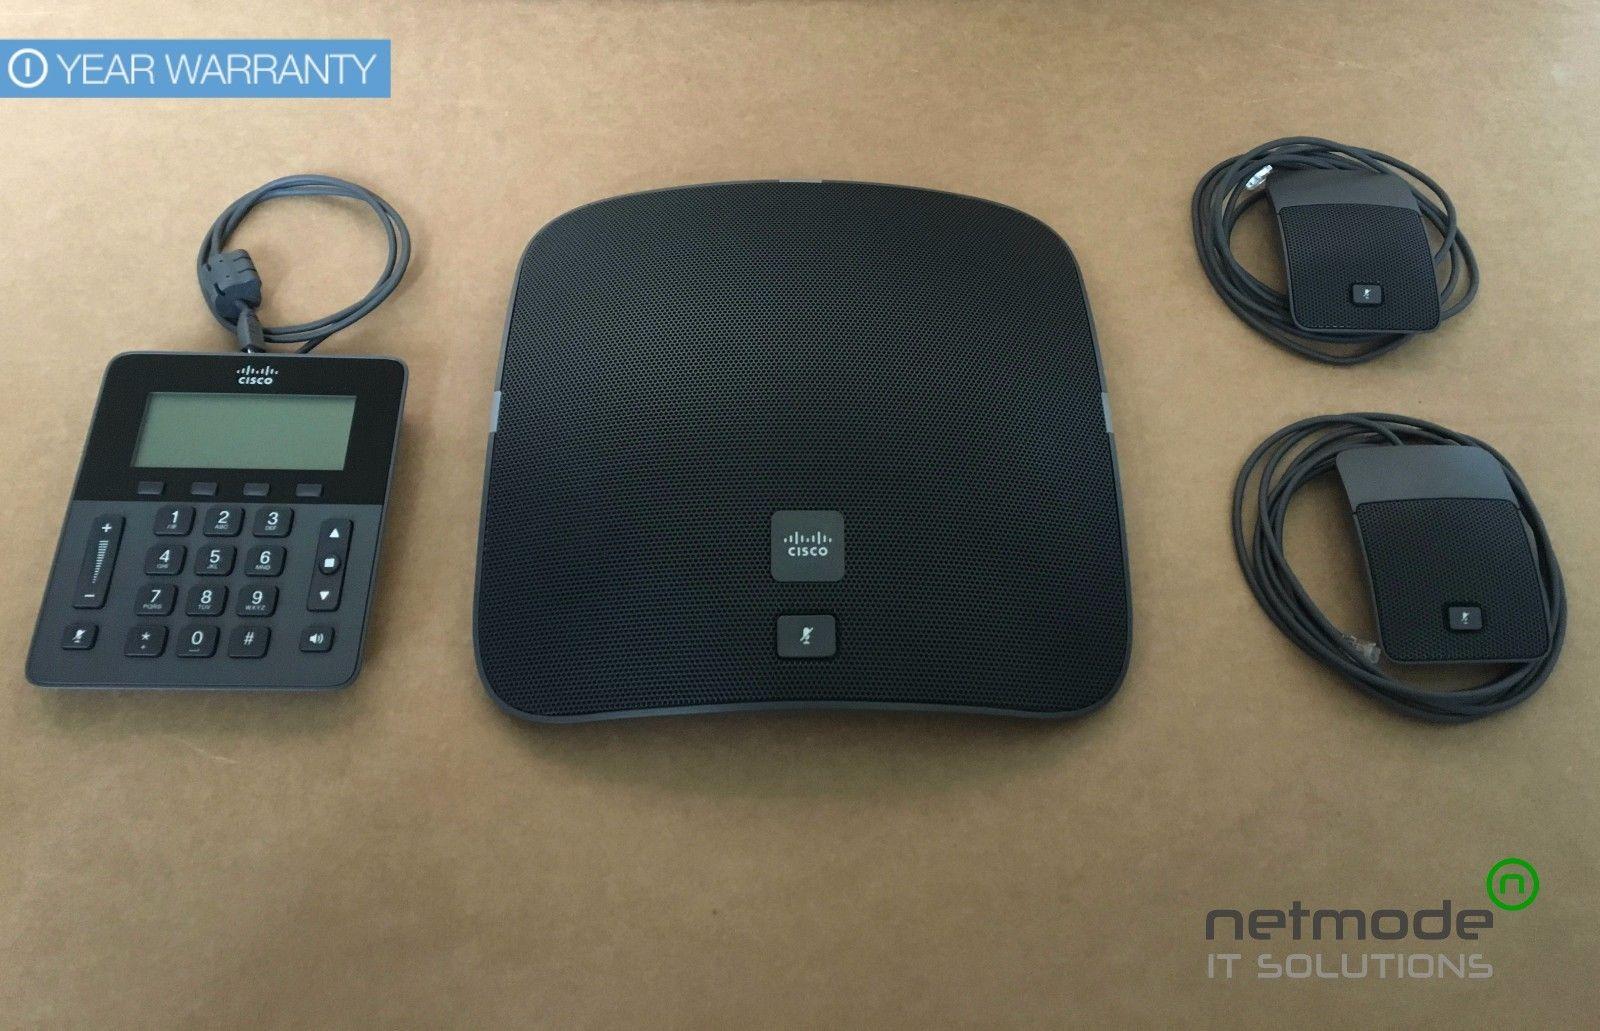 Cisco CP-8831-K9 IP Conference Station Set Up 8831 VoIP Phone + Base + Mic  Kit-refurbished